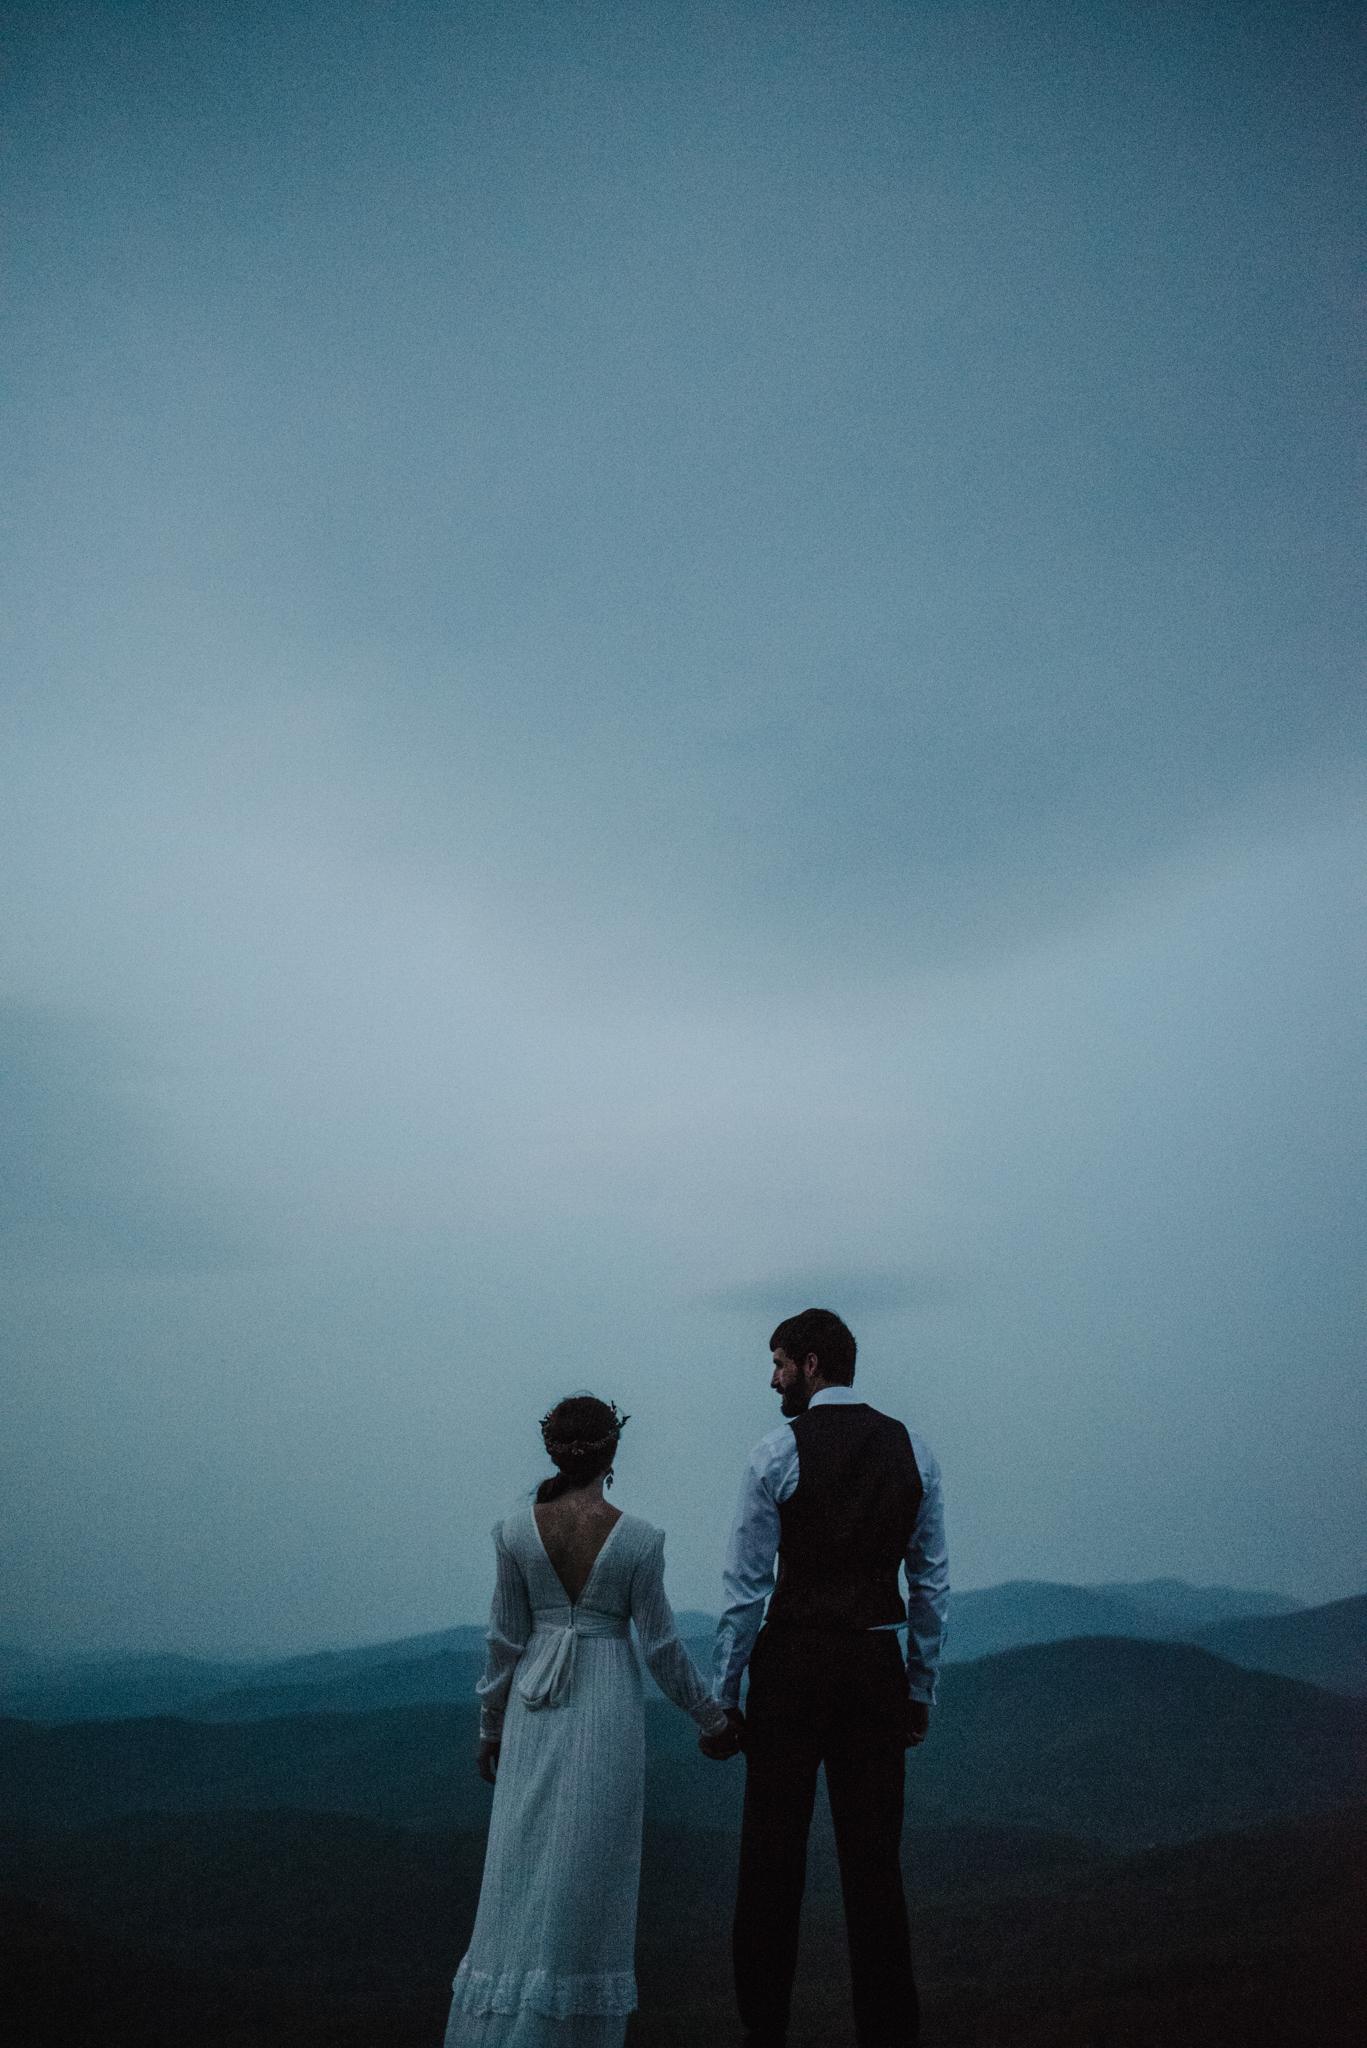 Lisa and Stuart - Post Wedding Couple Portraits - White Sails Creative - Blue Ridge Mountains - Sunrise Shenandoah National Park_8.JPG